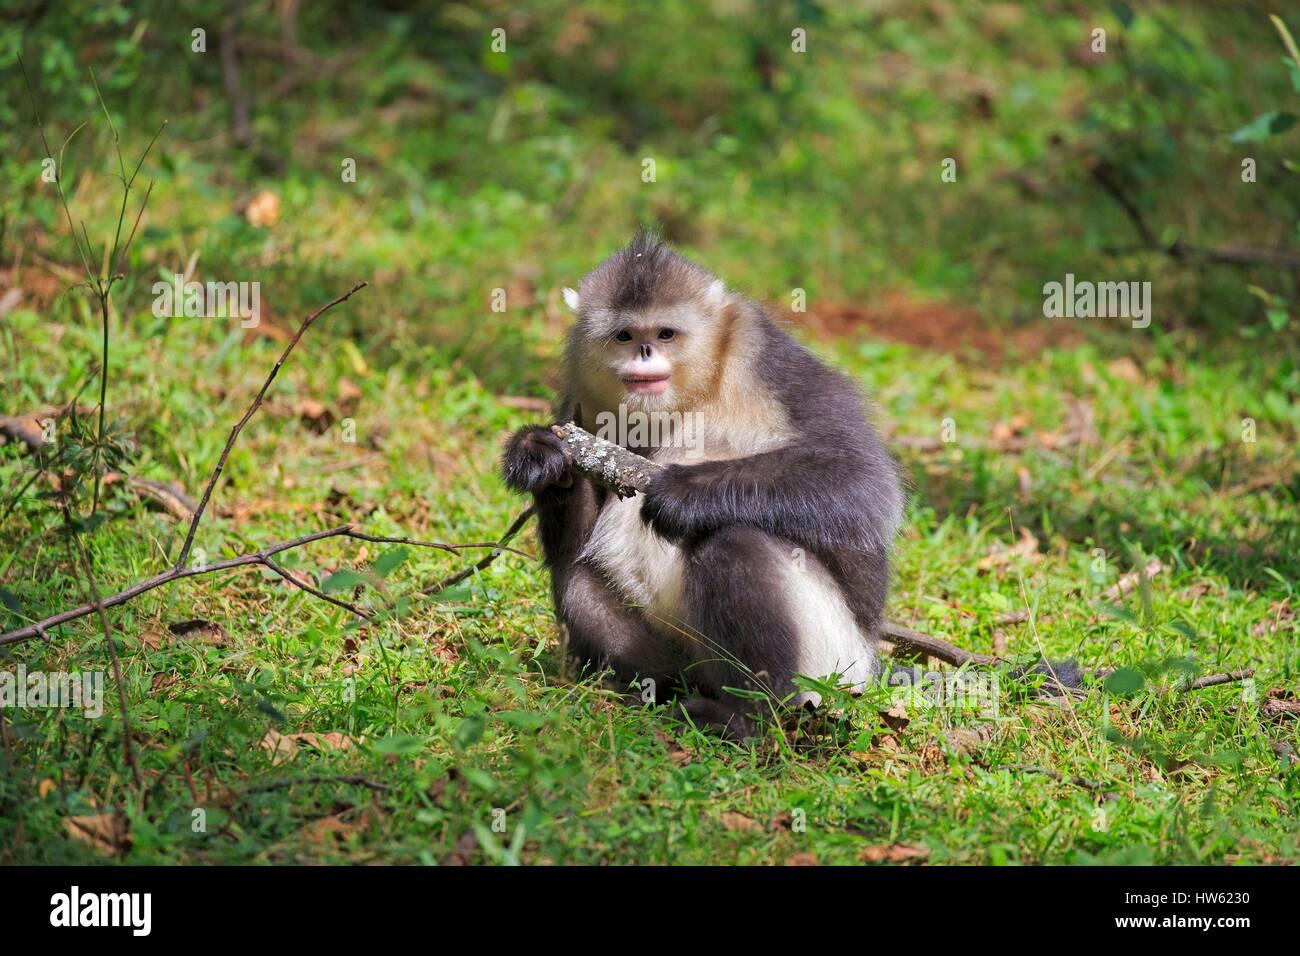 China, Yunnan province, Yunnan Snub-nosed Monkey (Rhinopithecus bieti) Stock Photo